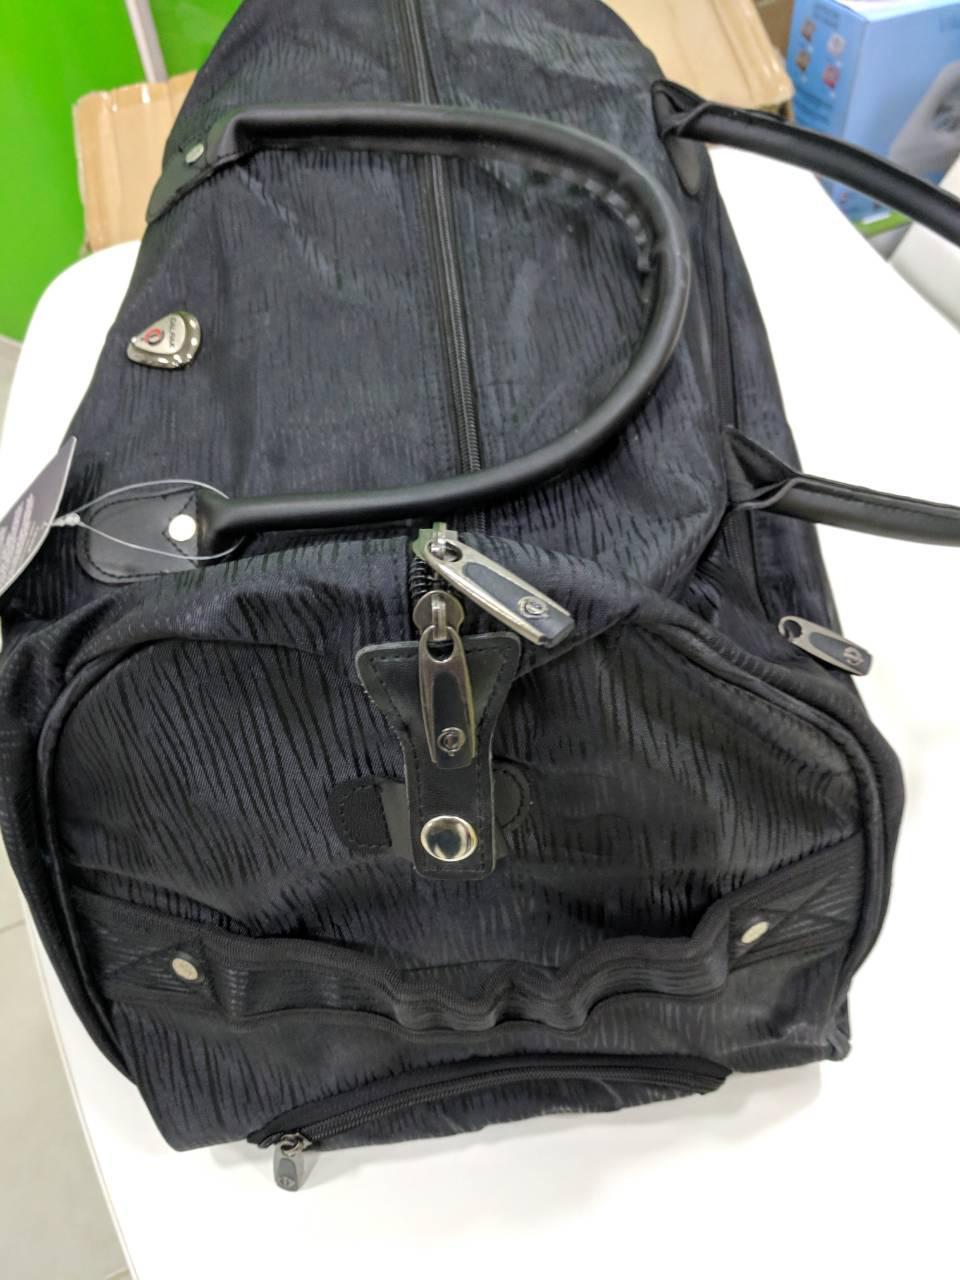 c08e795cae02 Дорожная спортивная сумка на колесиках Calpak : продажа, цена в ...